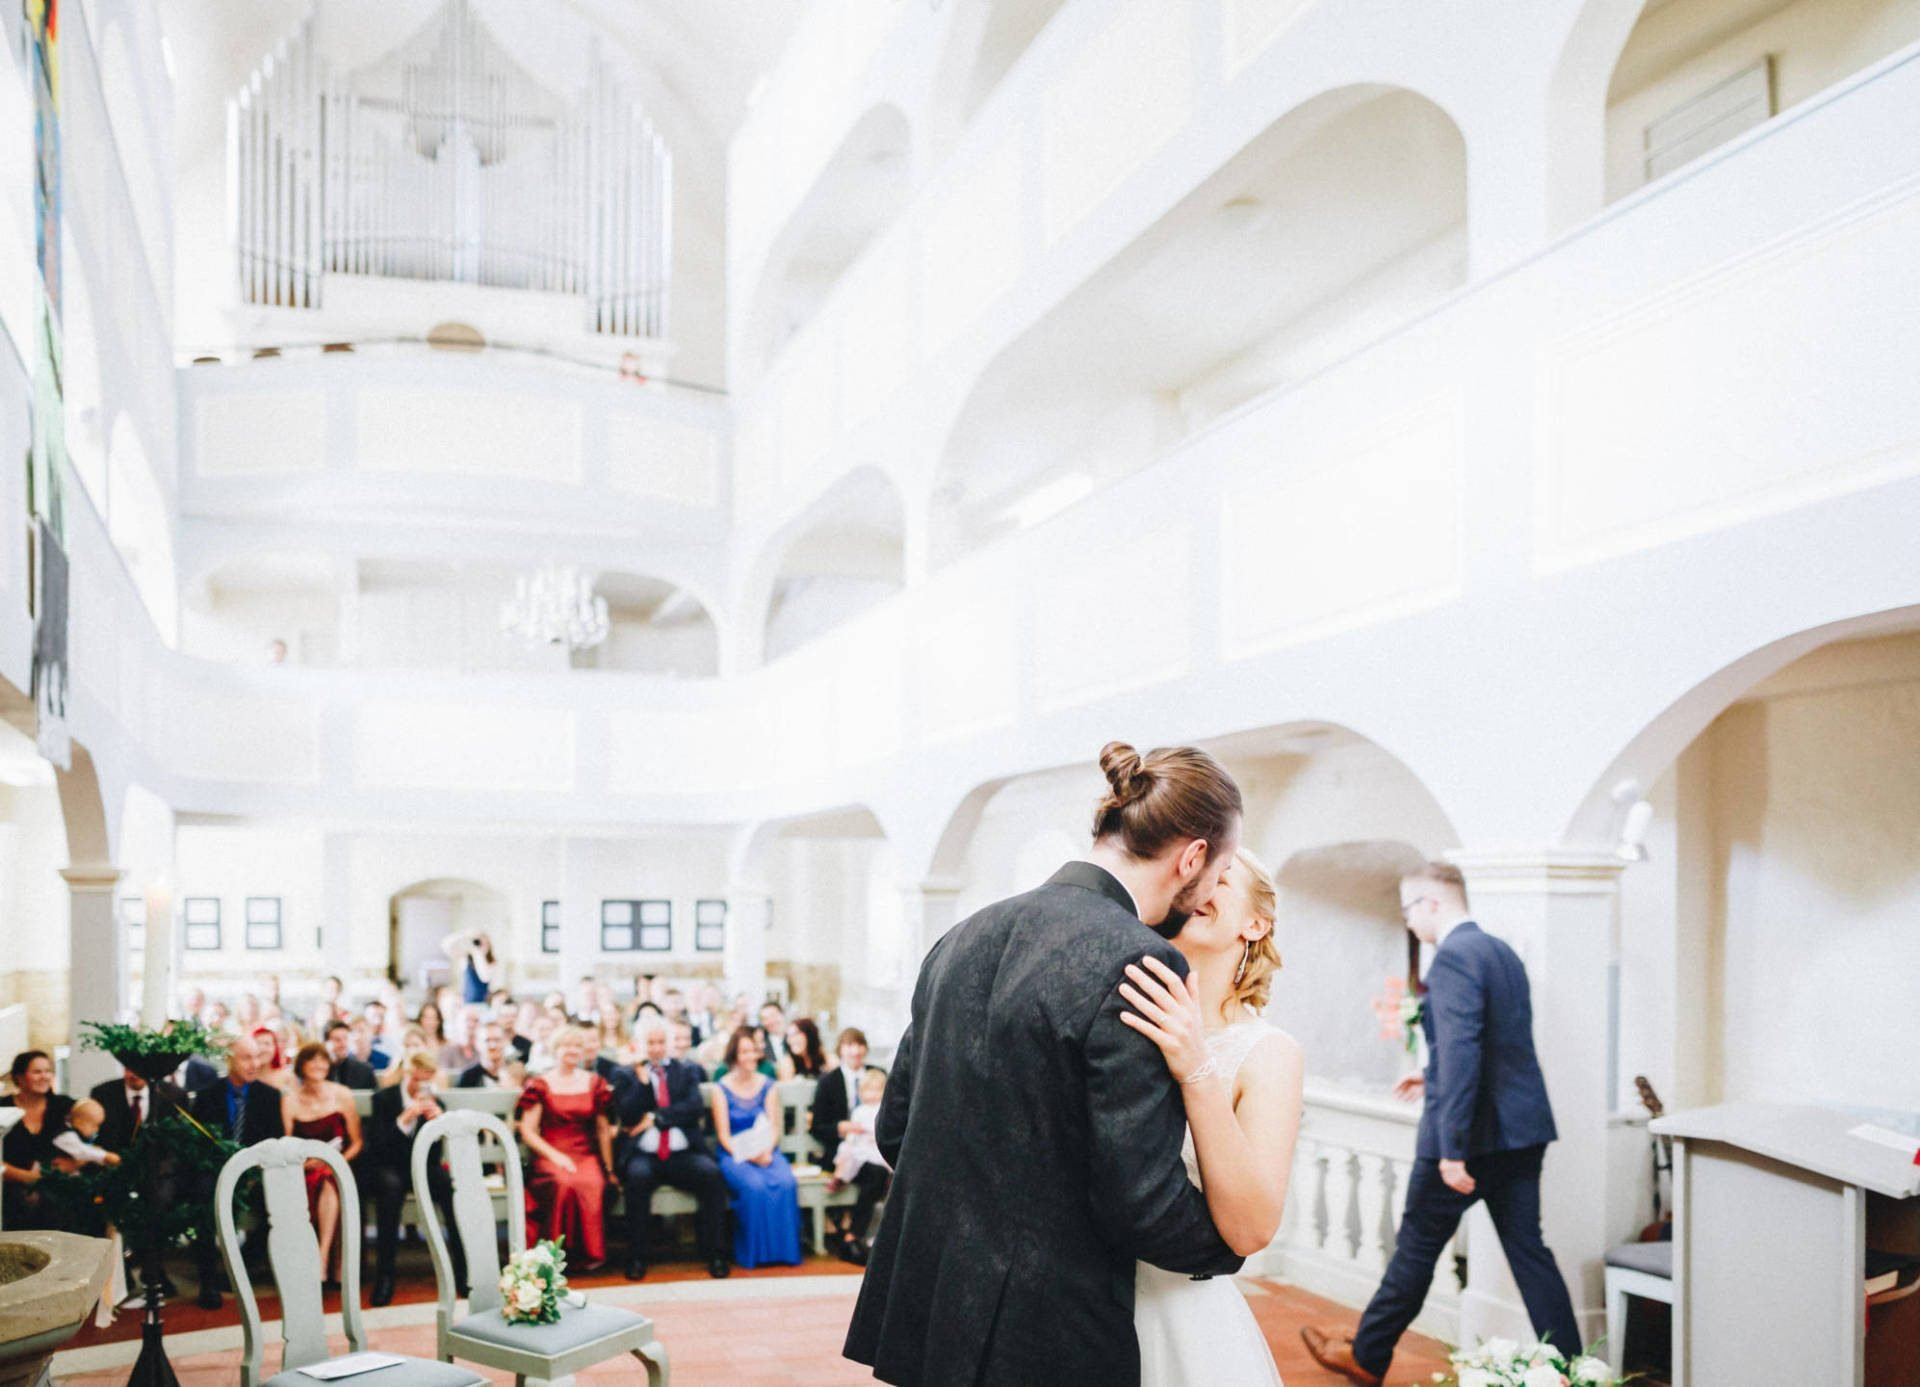 JuleSascha 11 1920x1387 - Hochzeit im alten Dornburger Schloss